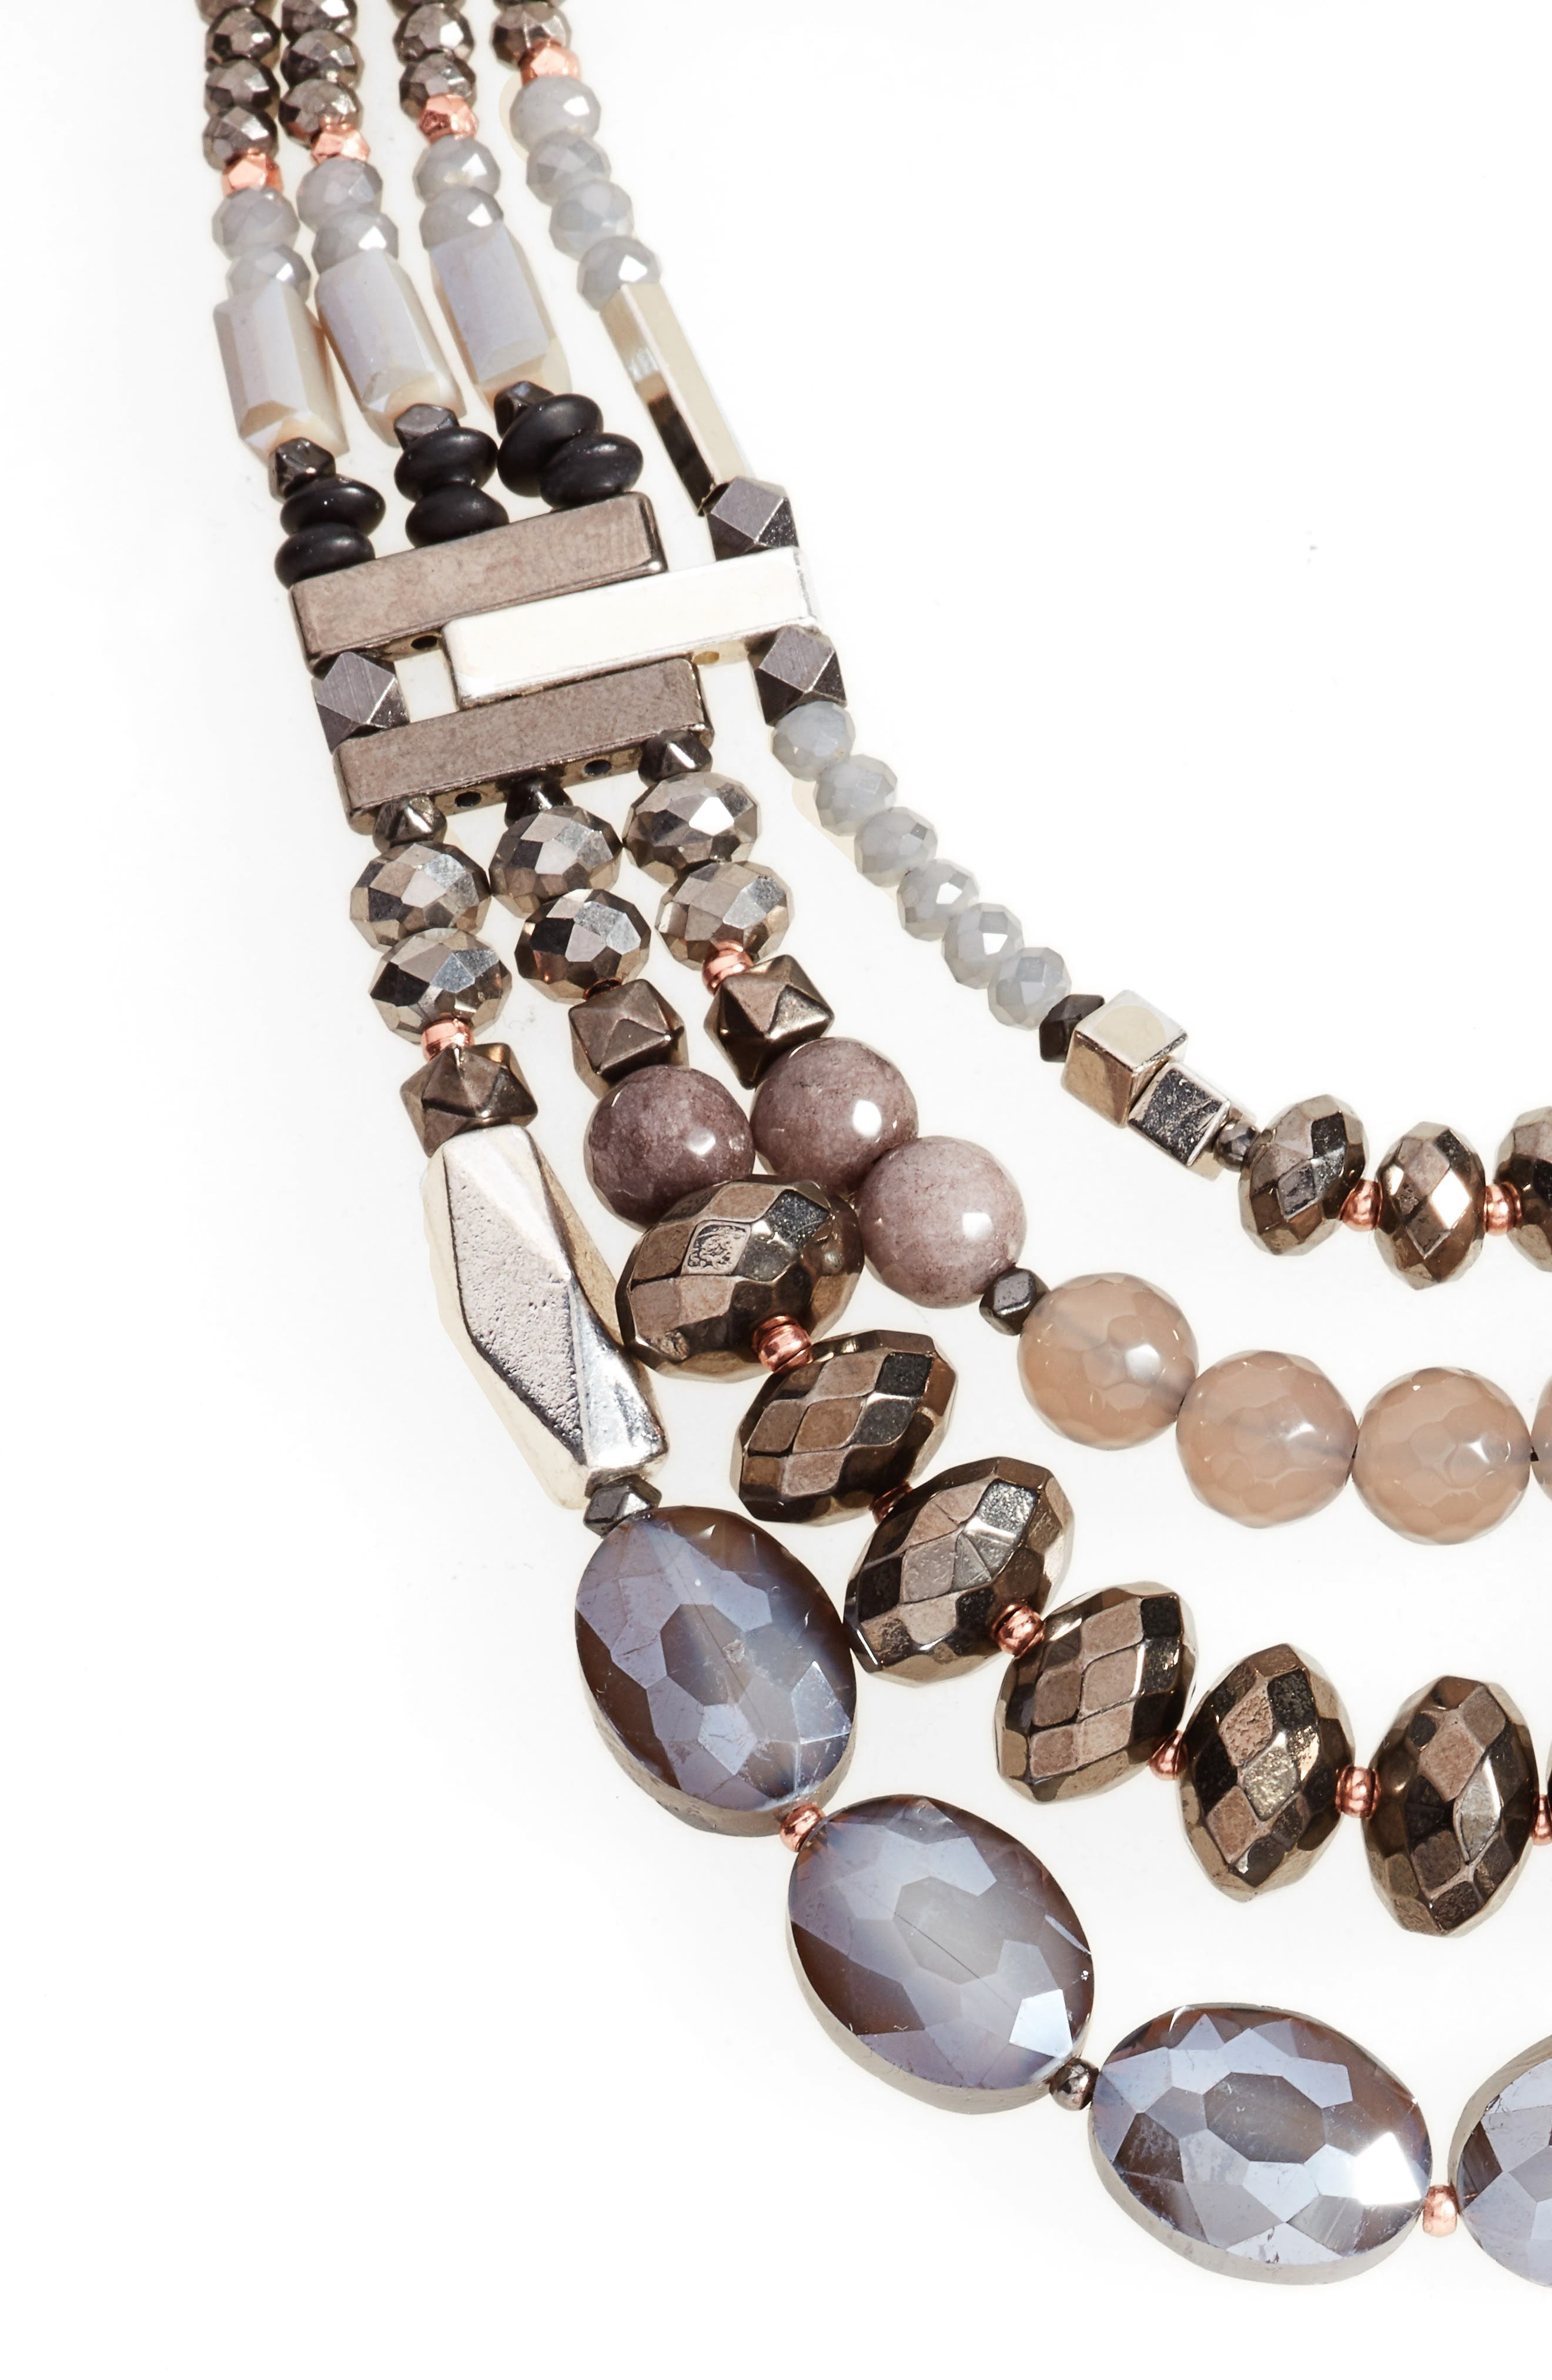 Alternate Image 1 Selected - Nakamol Design Multistrand Stone Necklace